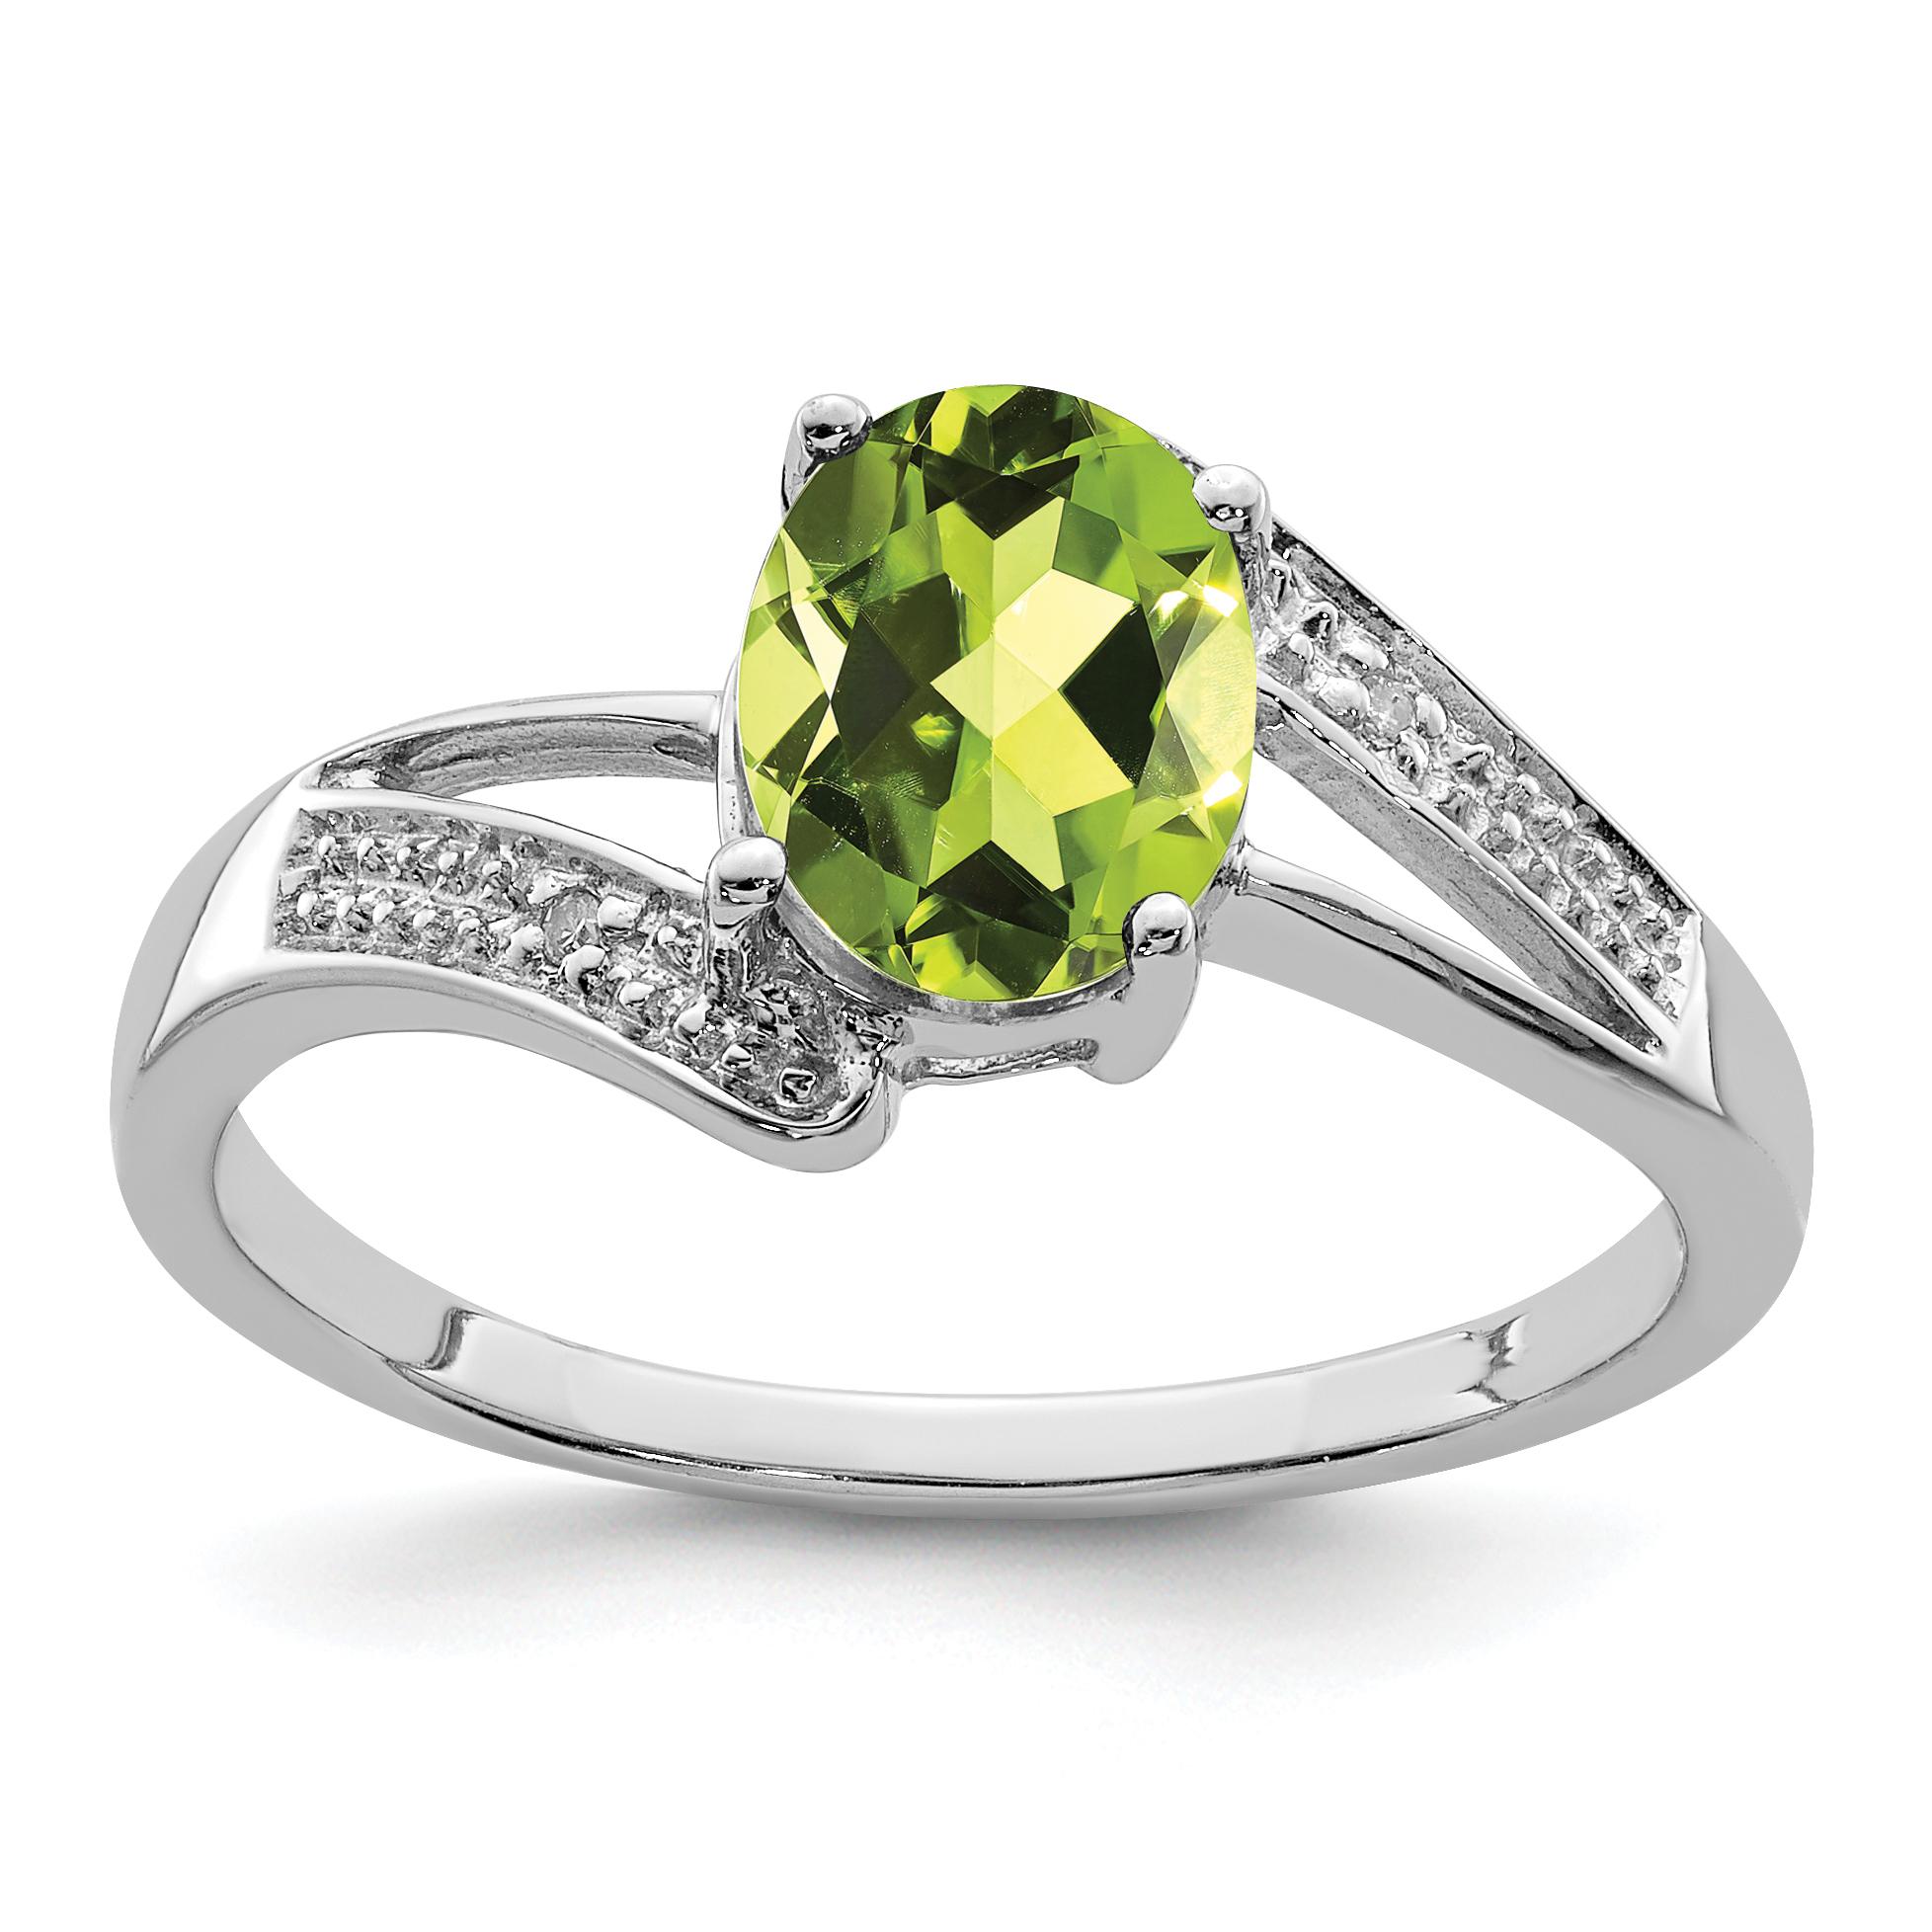 925 Sterling Silver Rhodium Peridot and Diamond Ring - image 2 de 2